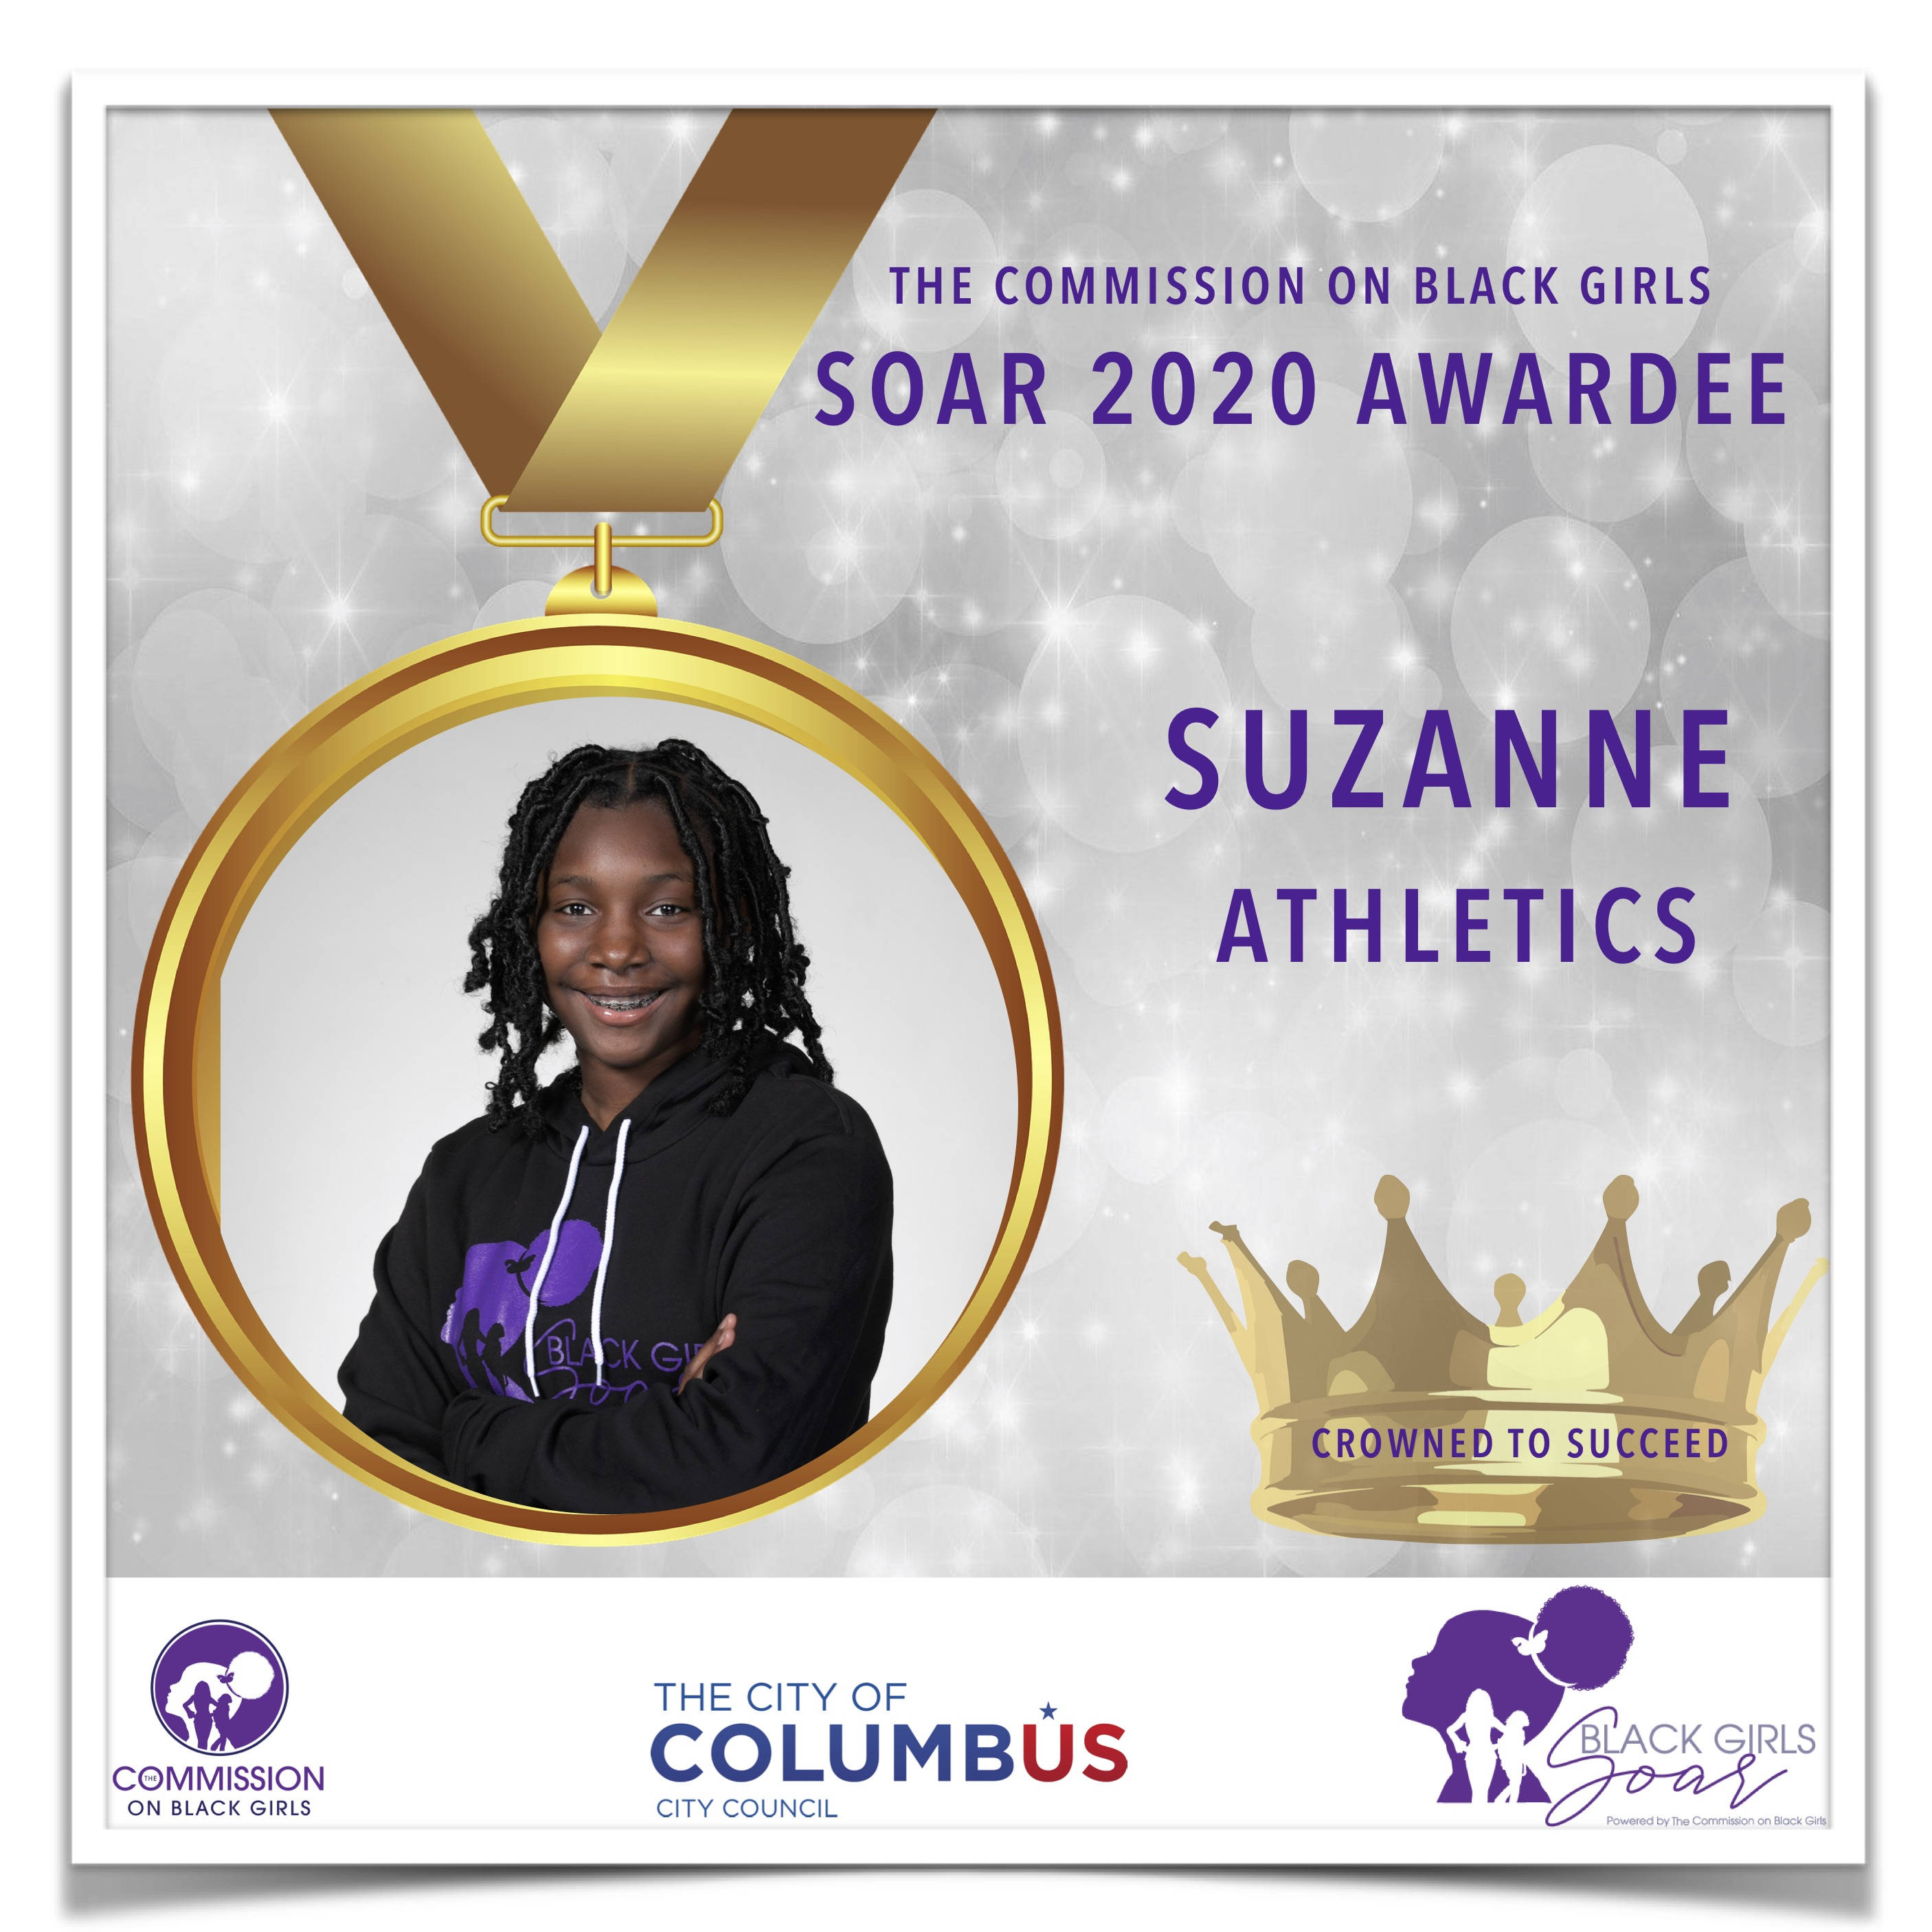 8 SOAR 2020 Suzanne Athletics